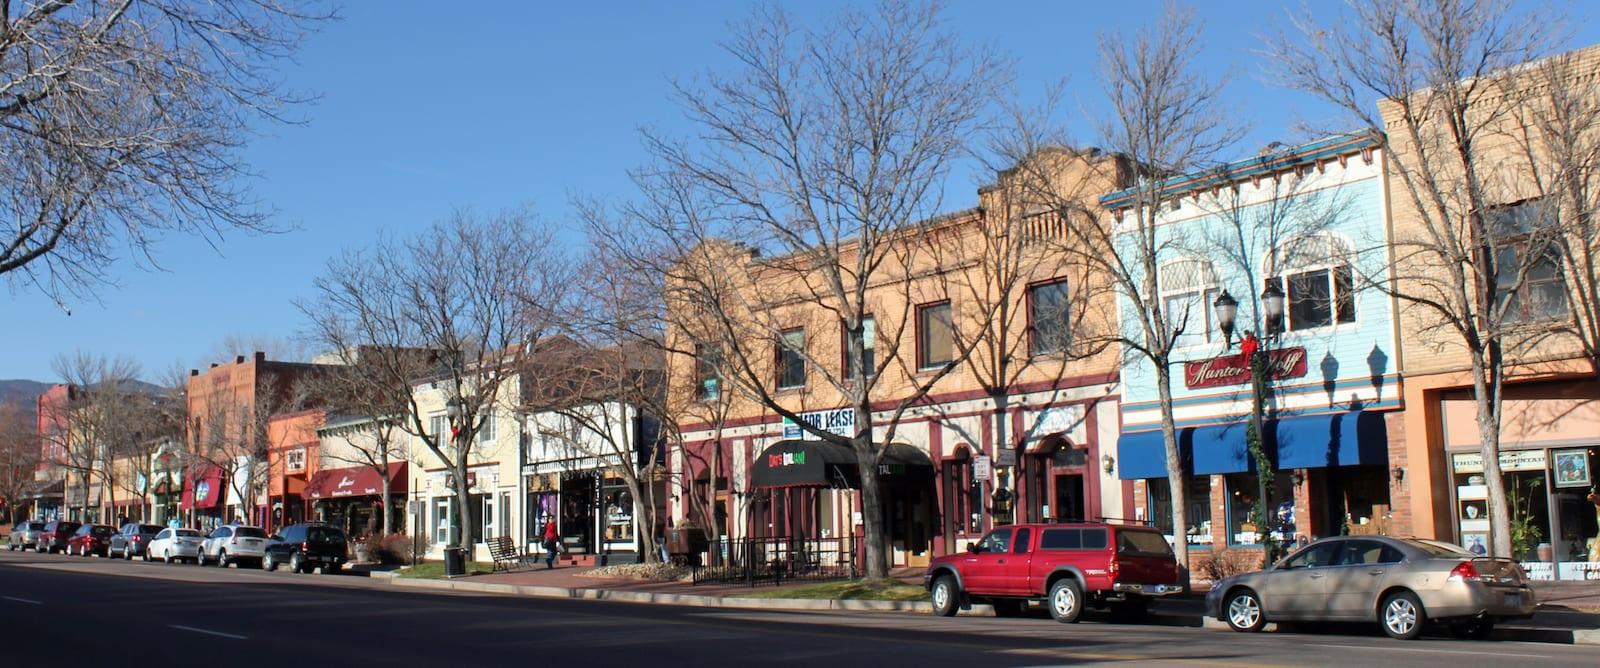 Old Colorado City Historic Commercial District